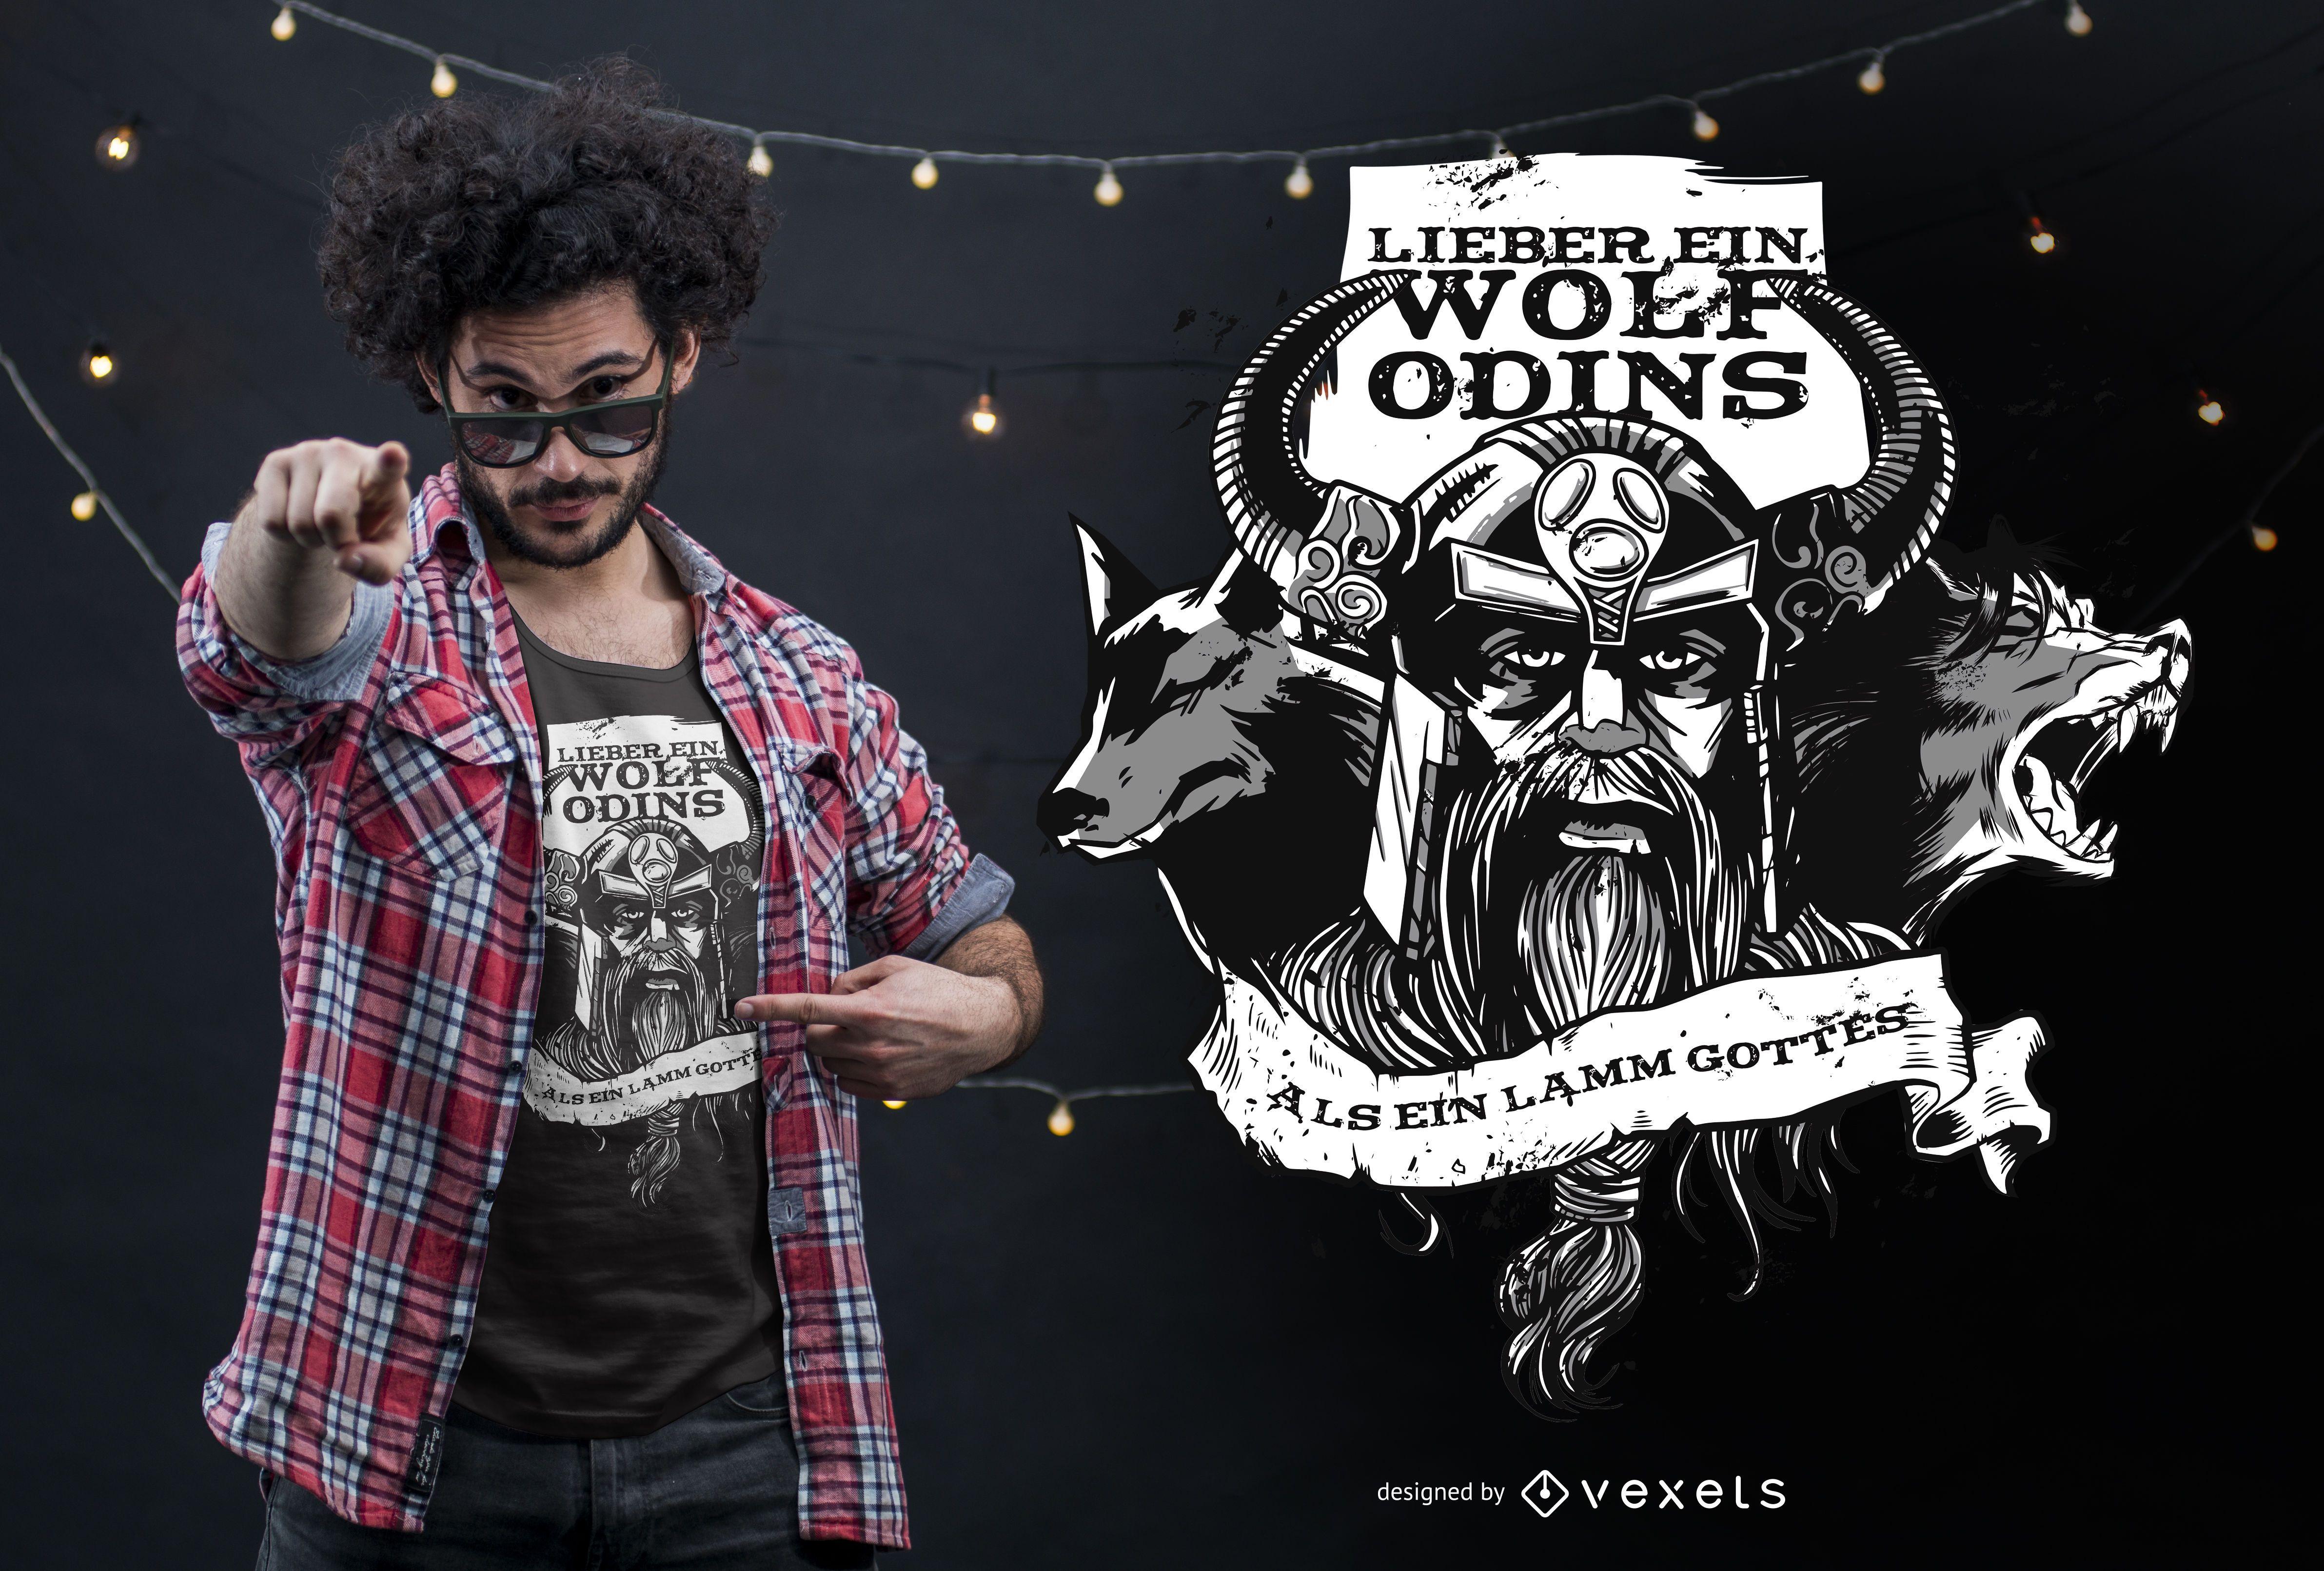 Dise?o de camiseta con cita alemana del lobo de Odin